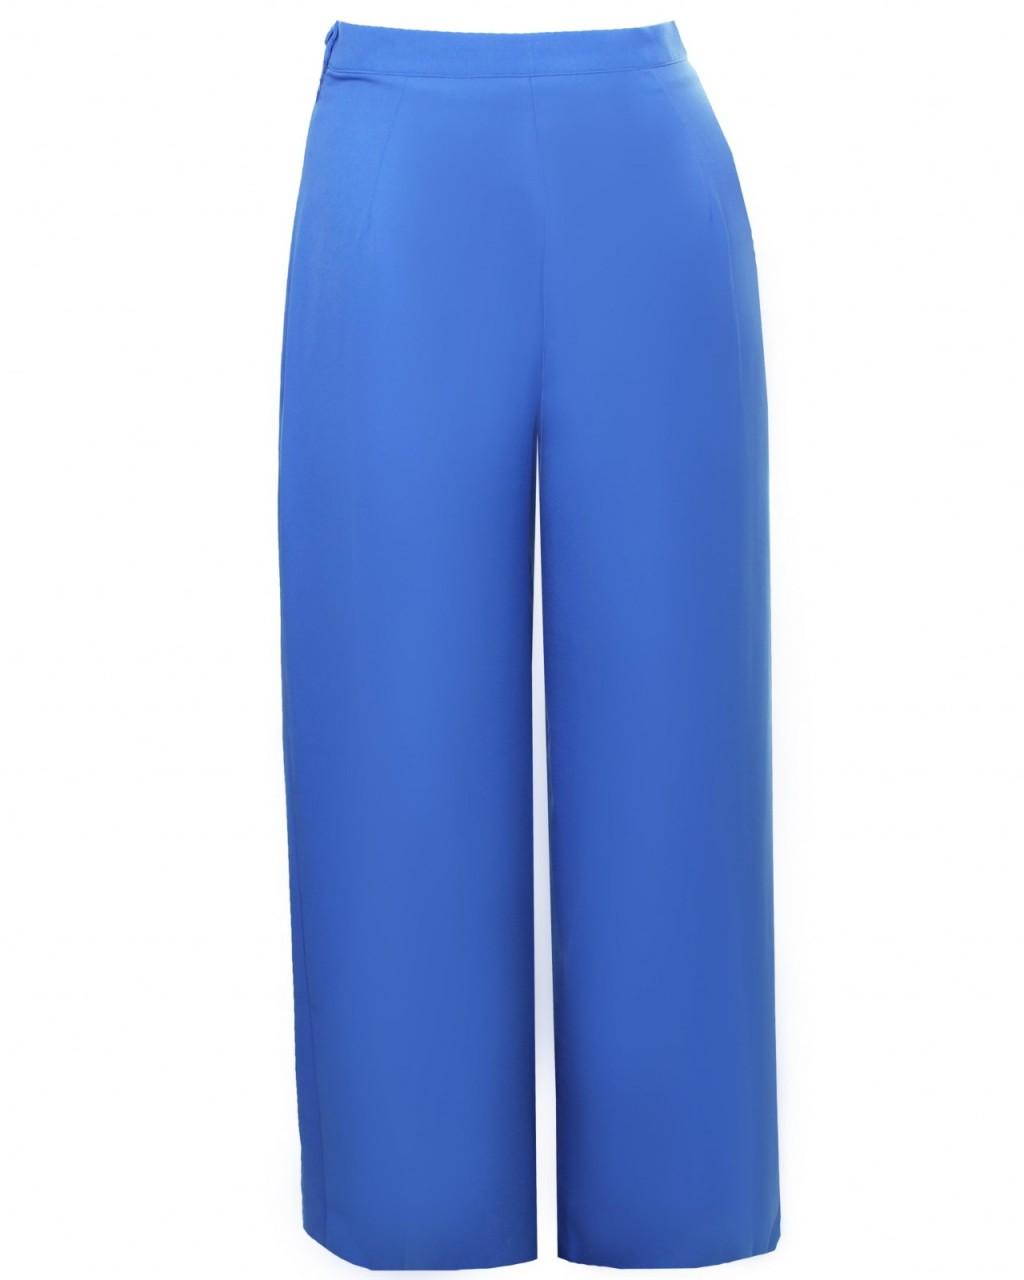 LOVE Blue Palazzo Pants